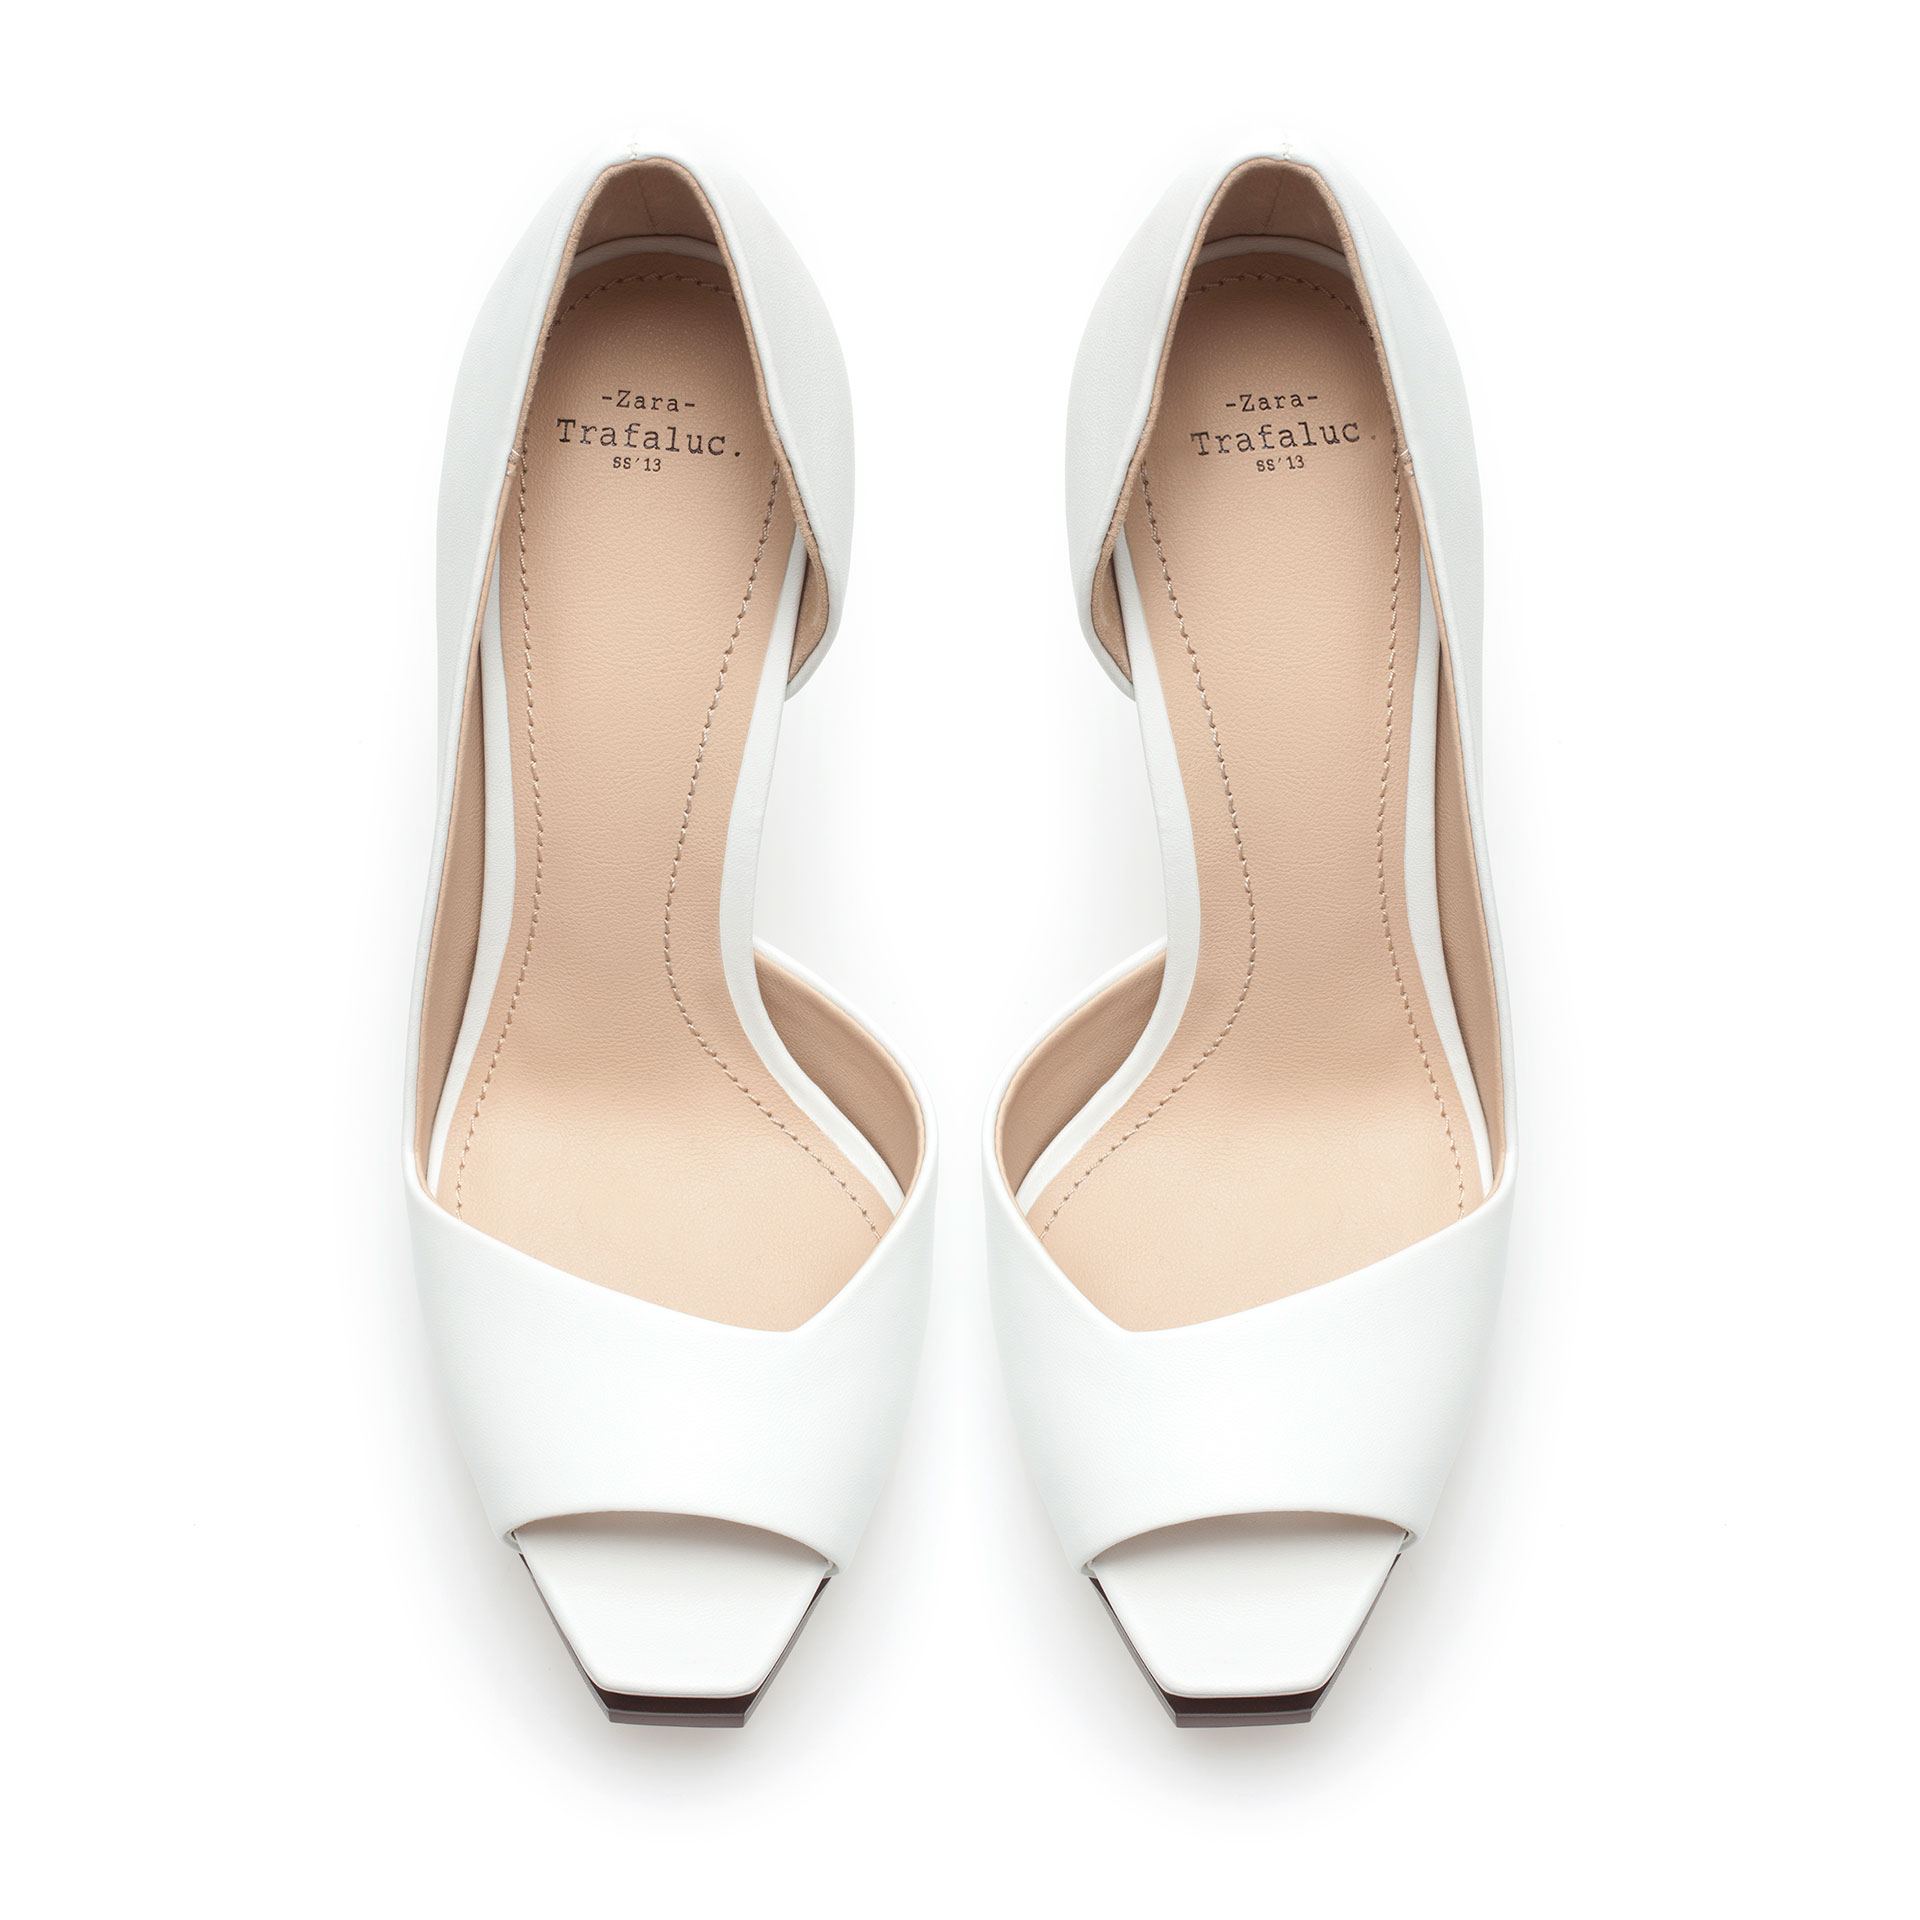 Off White Peep Toe Heels